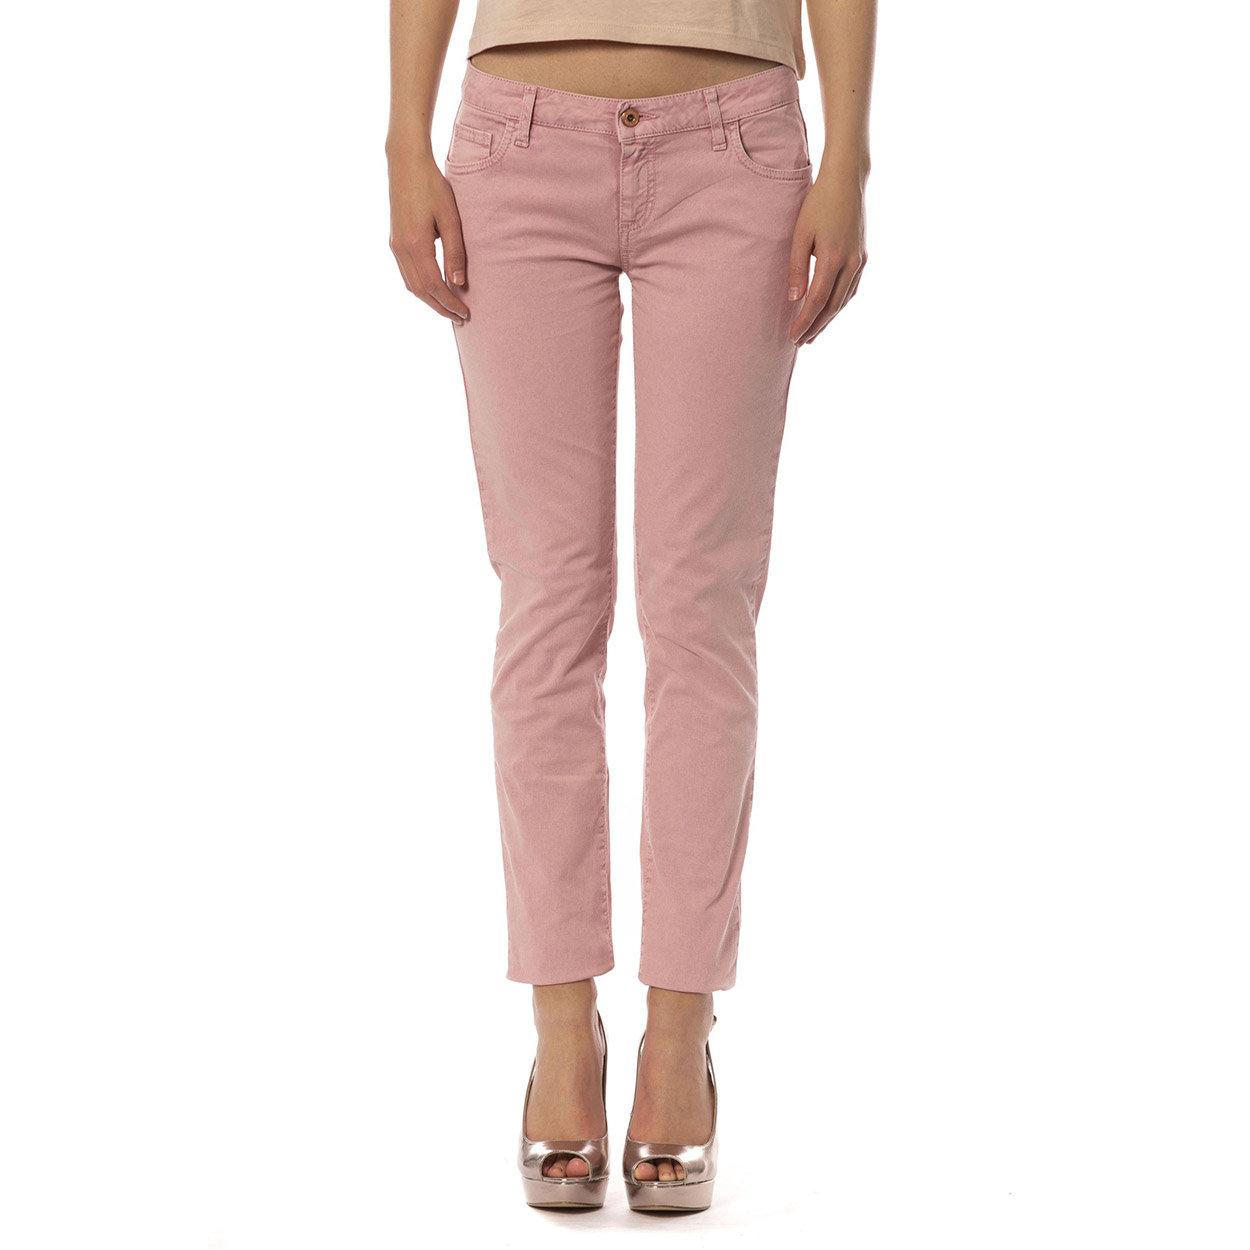 Jeans modello 5 tasche rosa